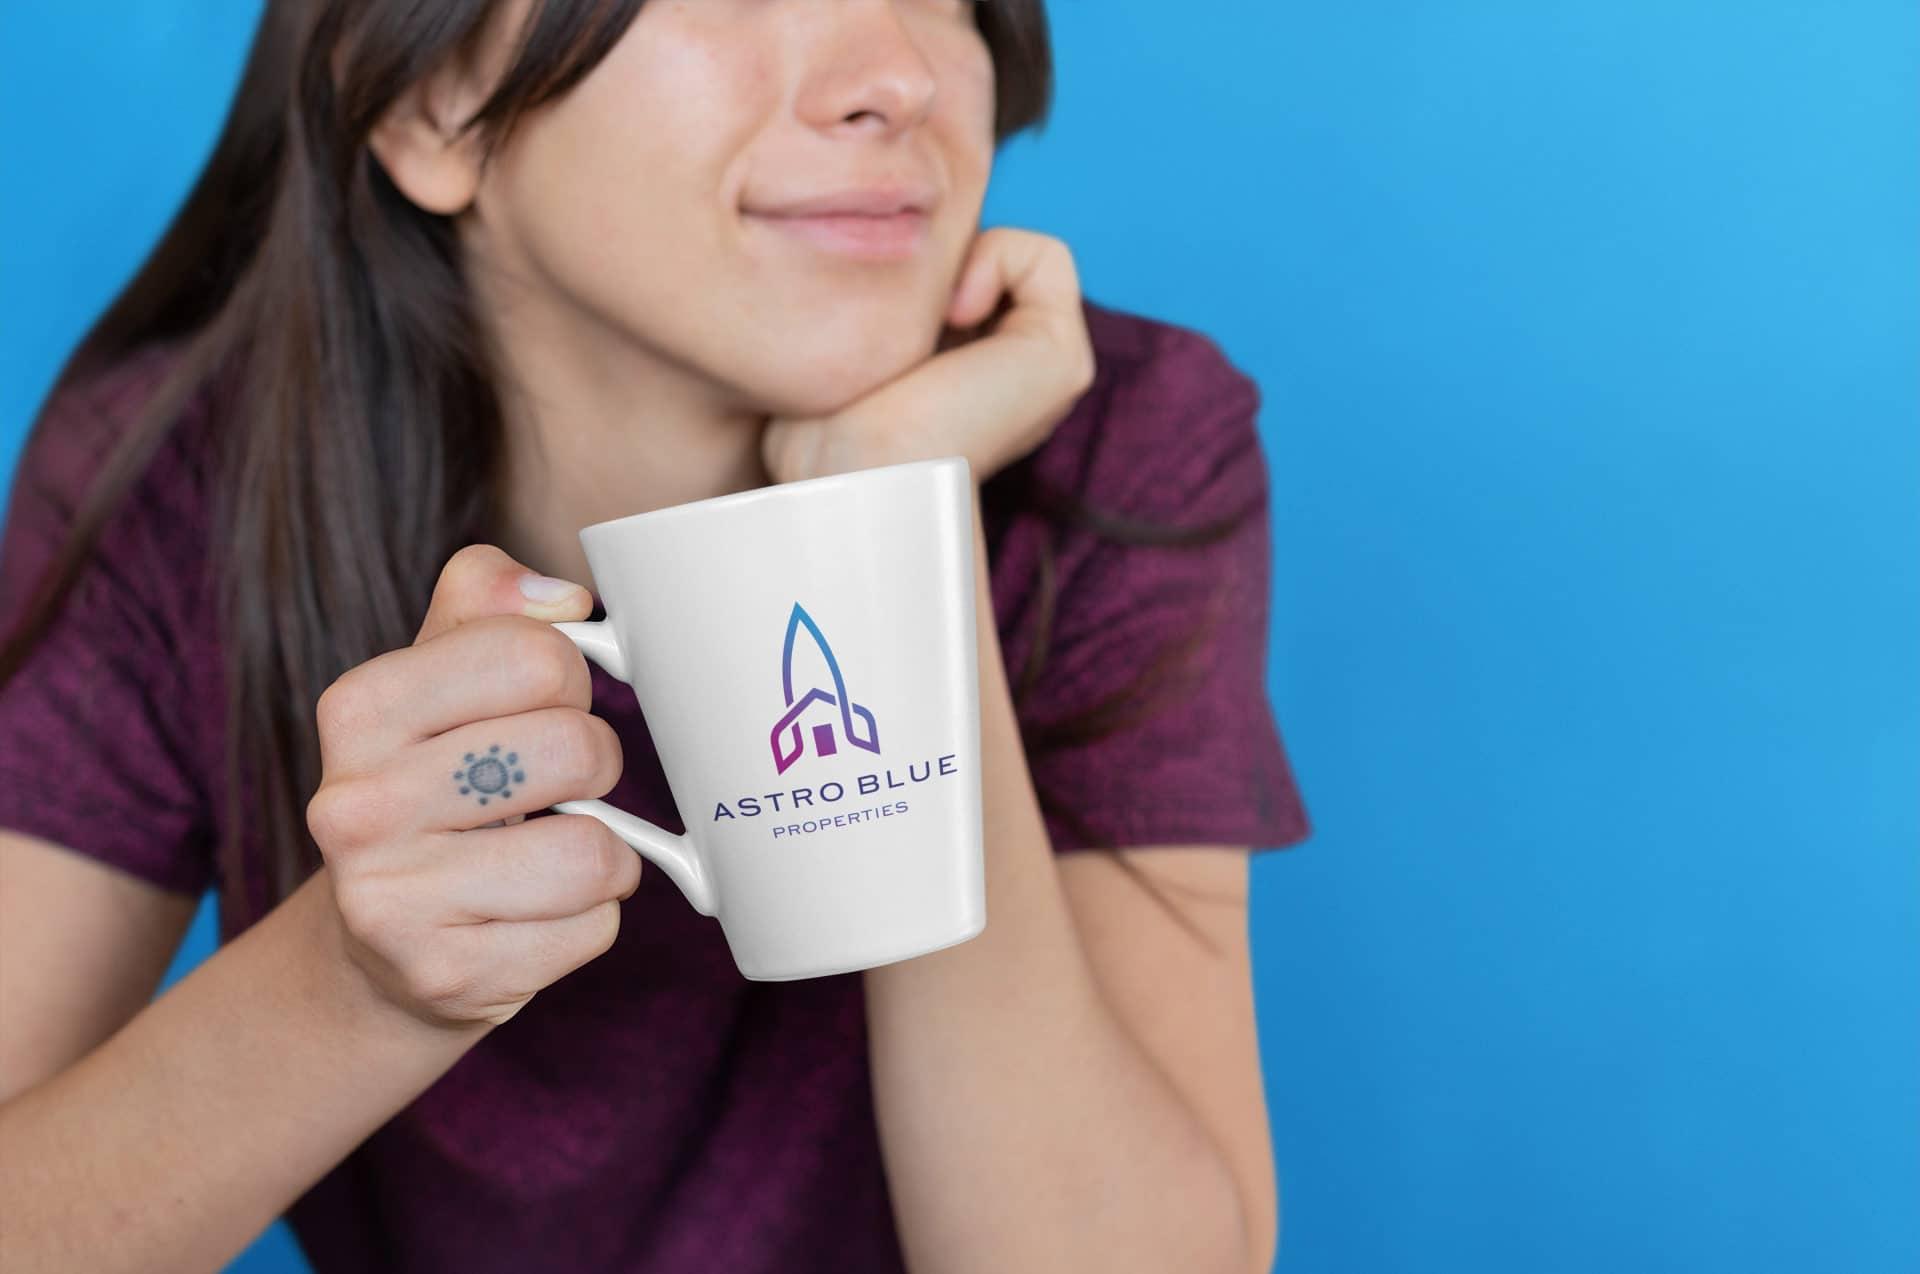 Astro Blue Properties logo on a mug